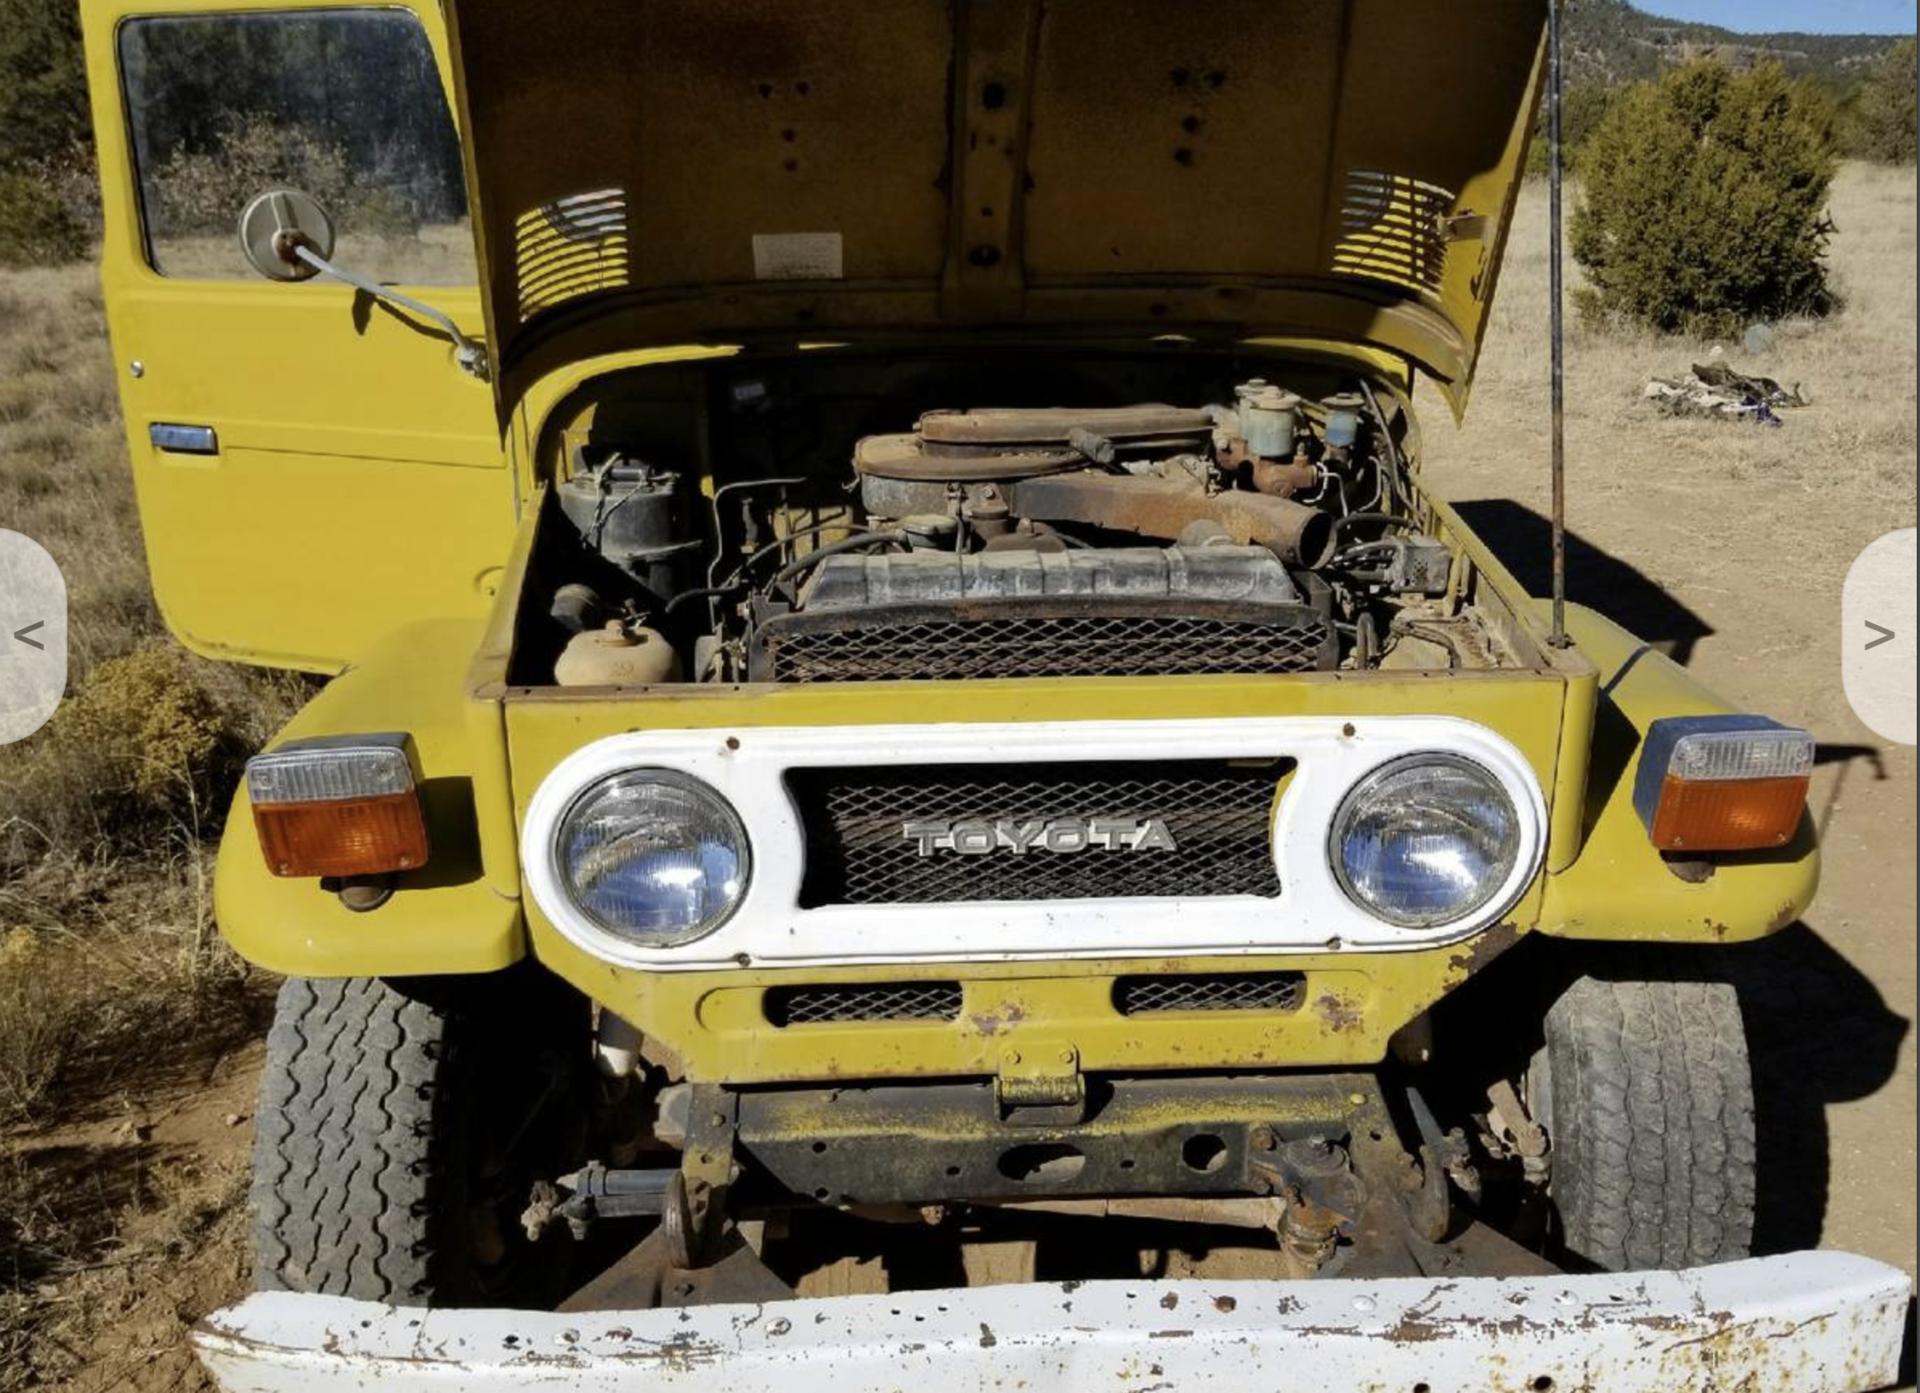 craigslist - Not mine 75 yellow fj40 | IH8MUD Forum